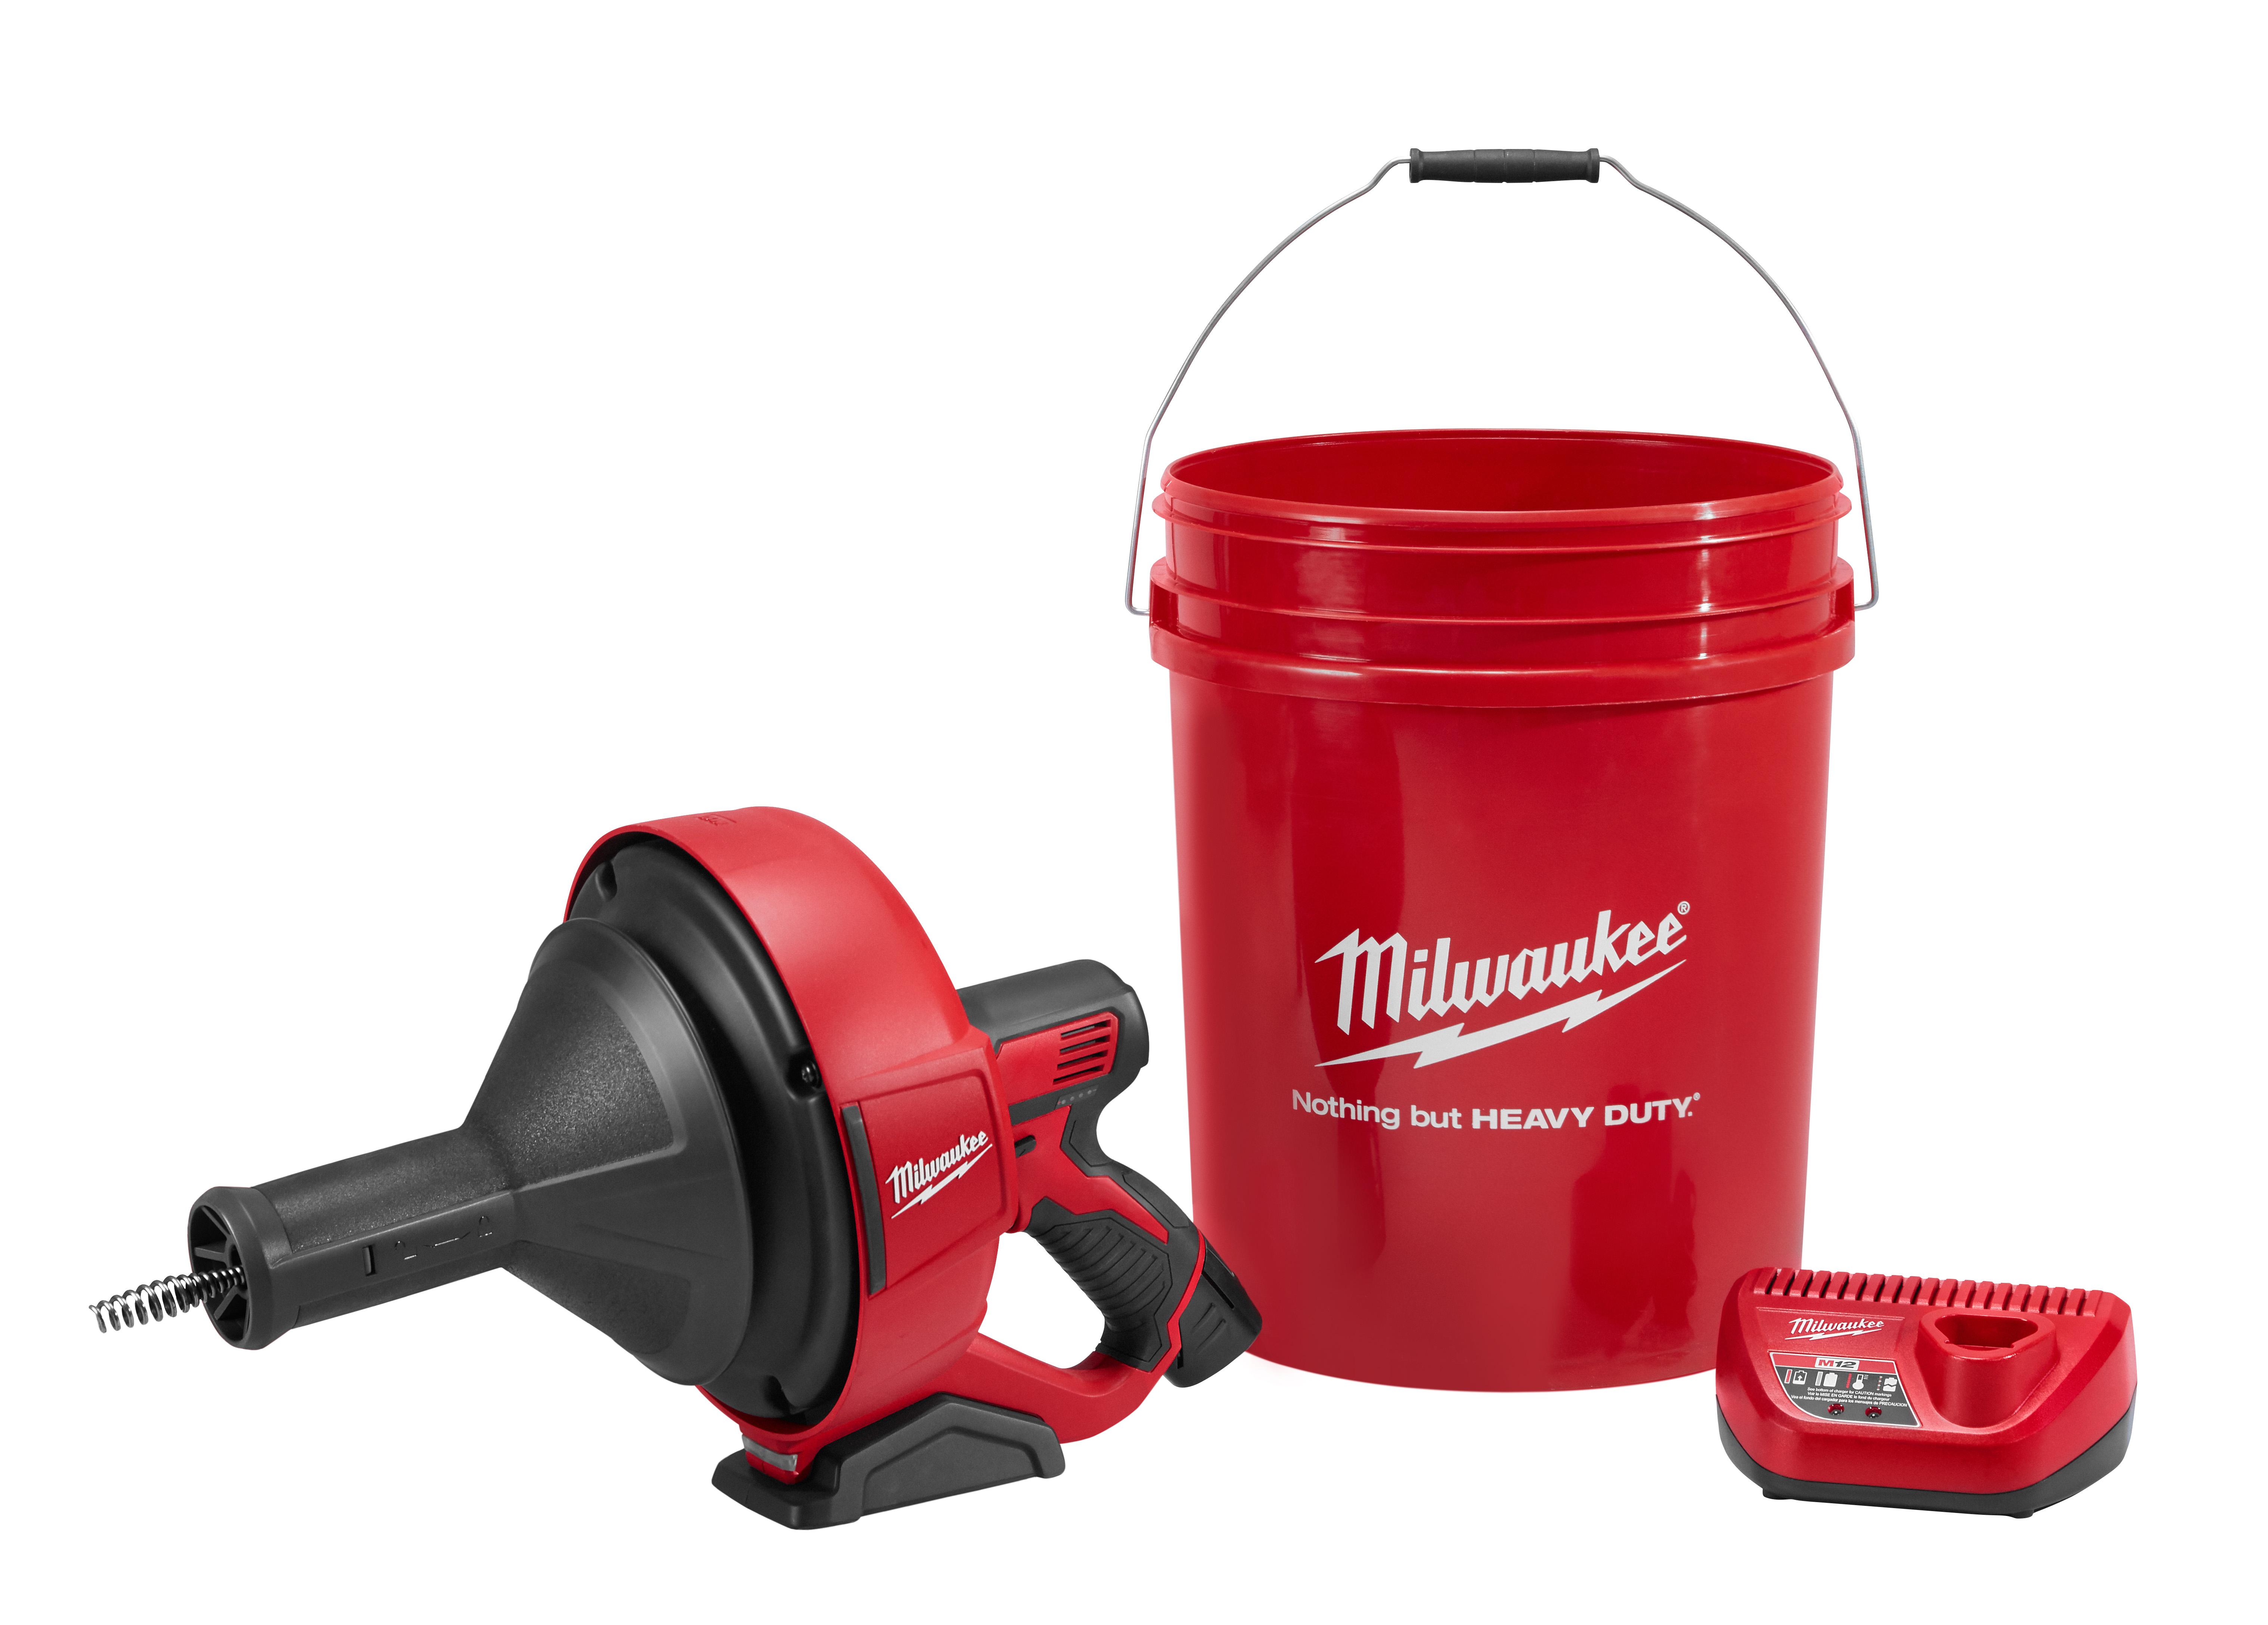 Milwaukee® M12™ 2571-21 Cordless Drain Snake Kit, 1-1/4 to 2-1/2 in Drain Line, 25 ft Max Run, 12 VDC, Metal Housing